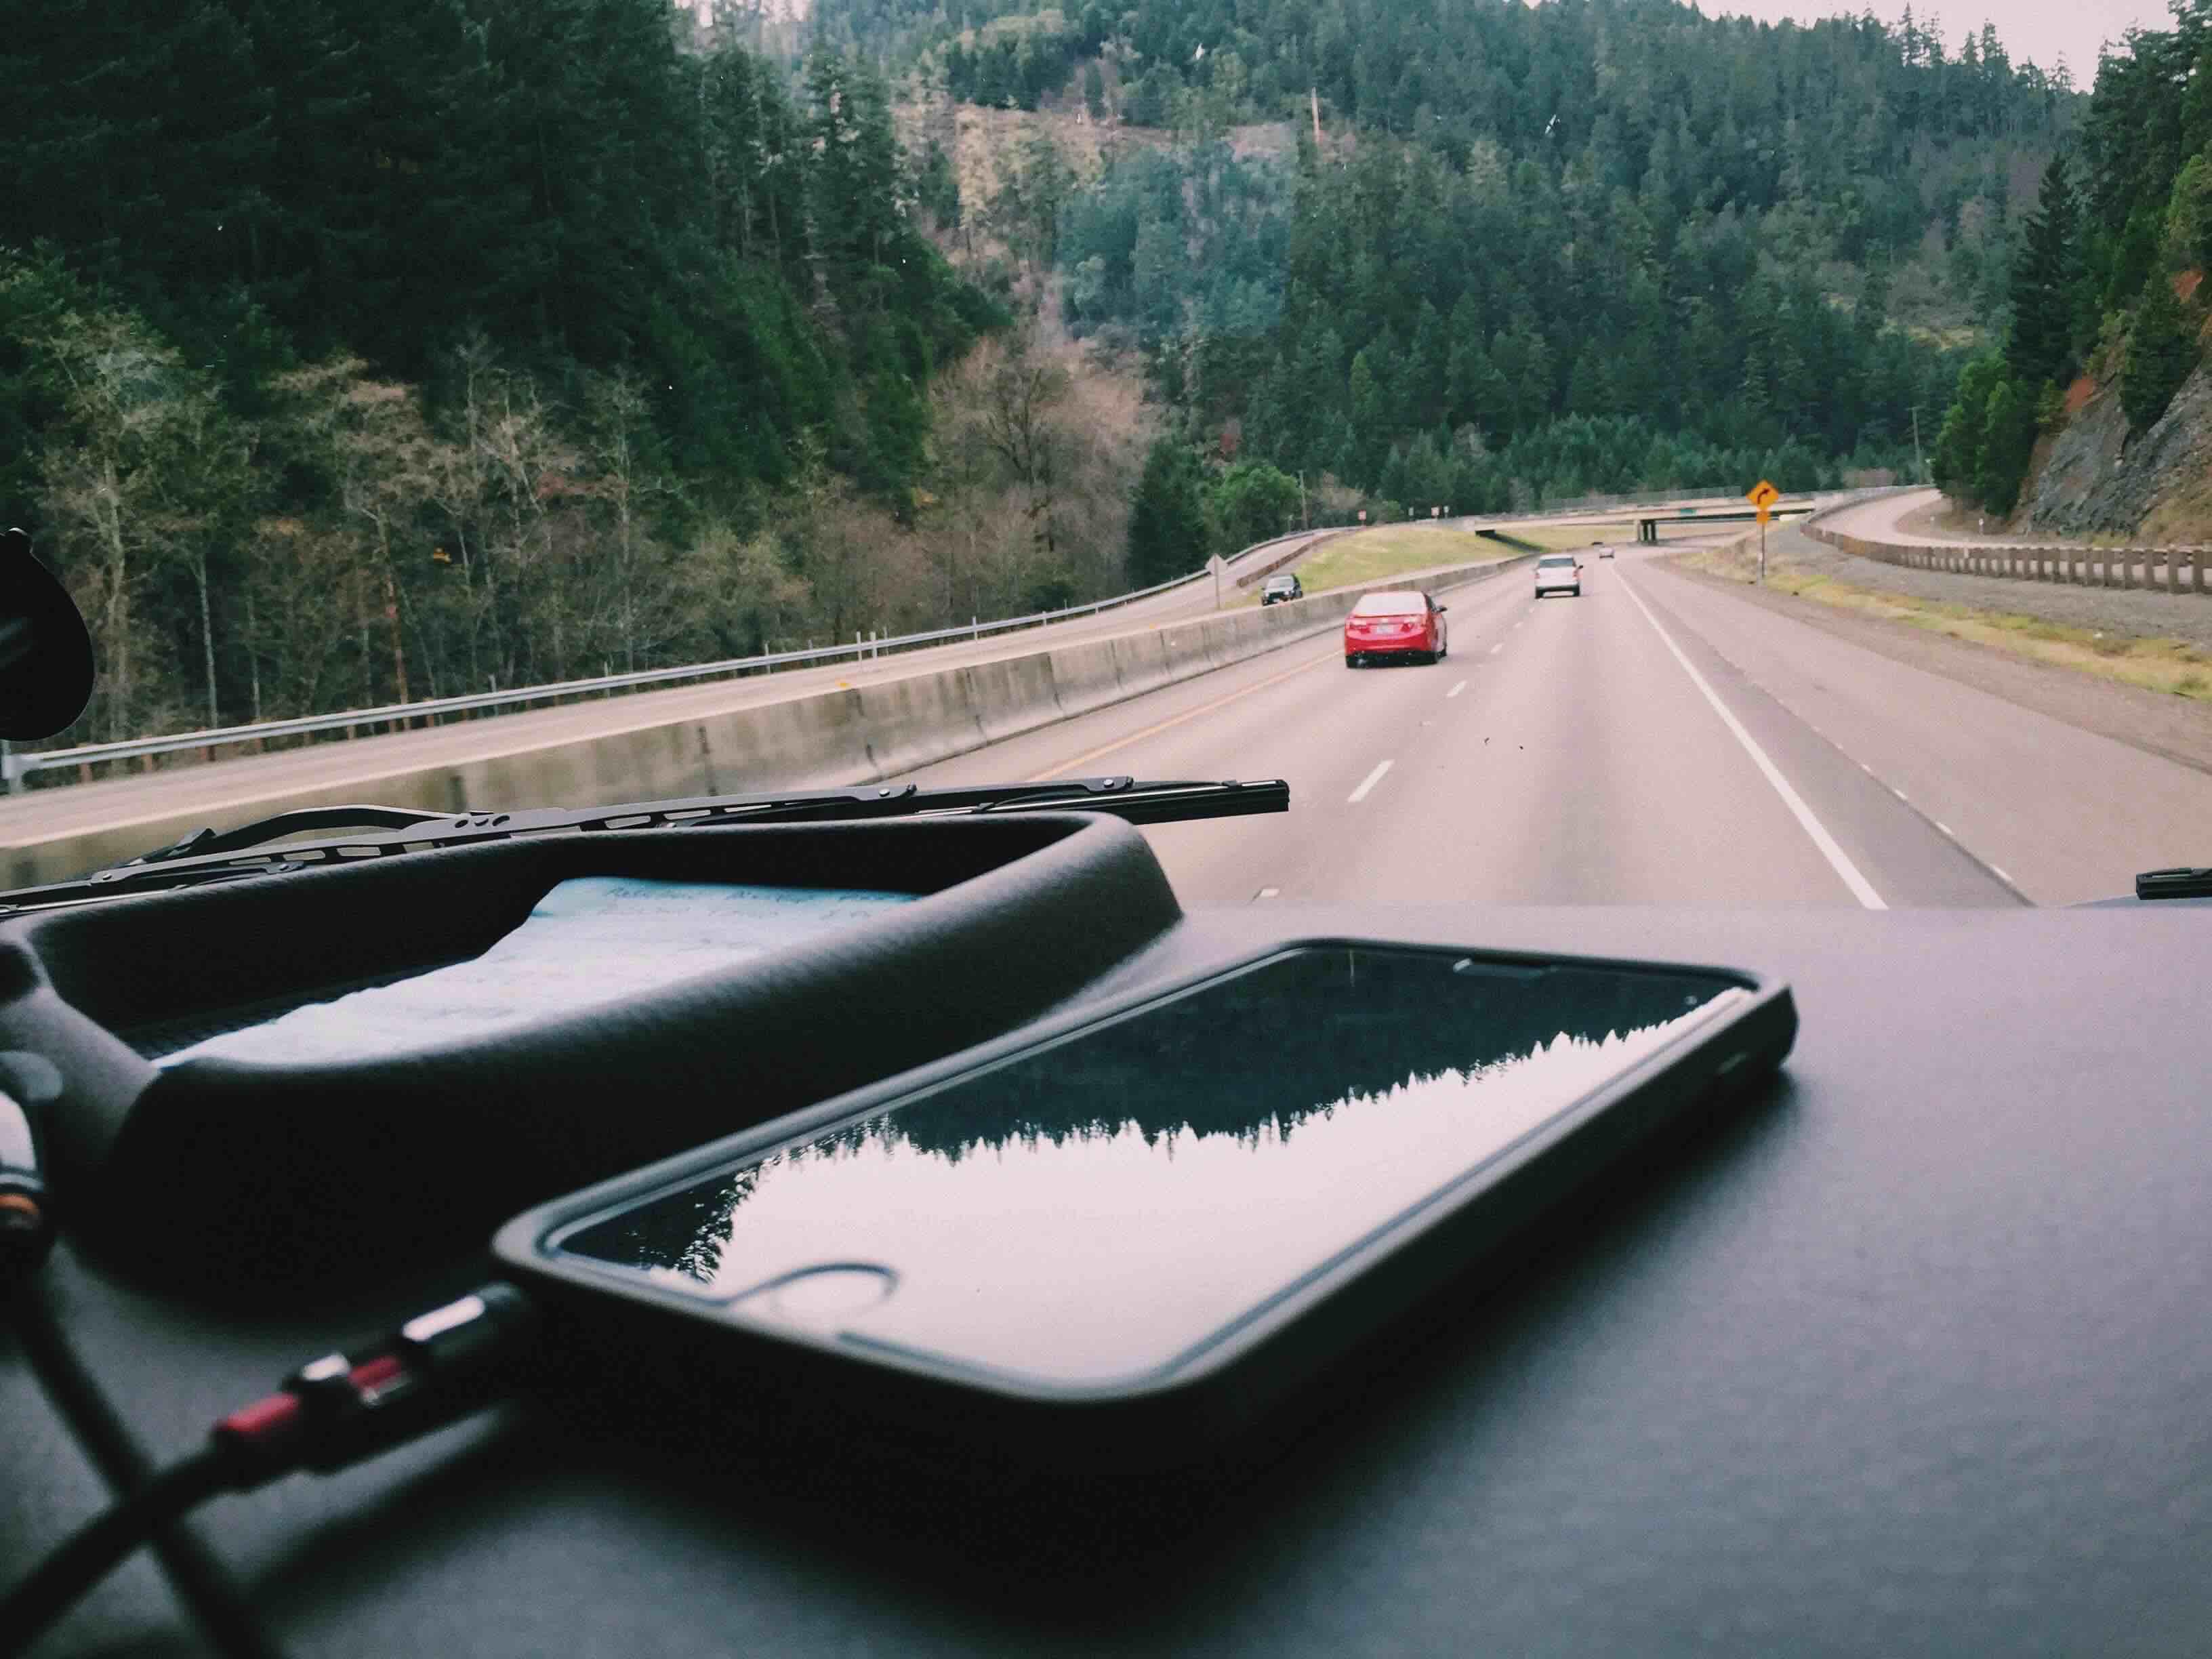 light-road-nature-iphone